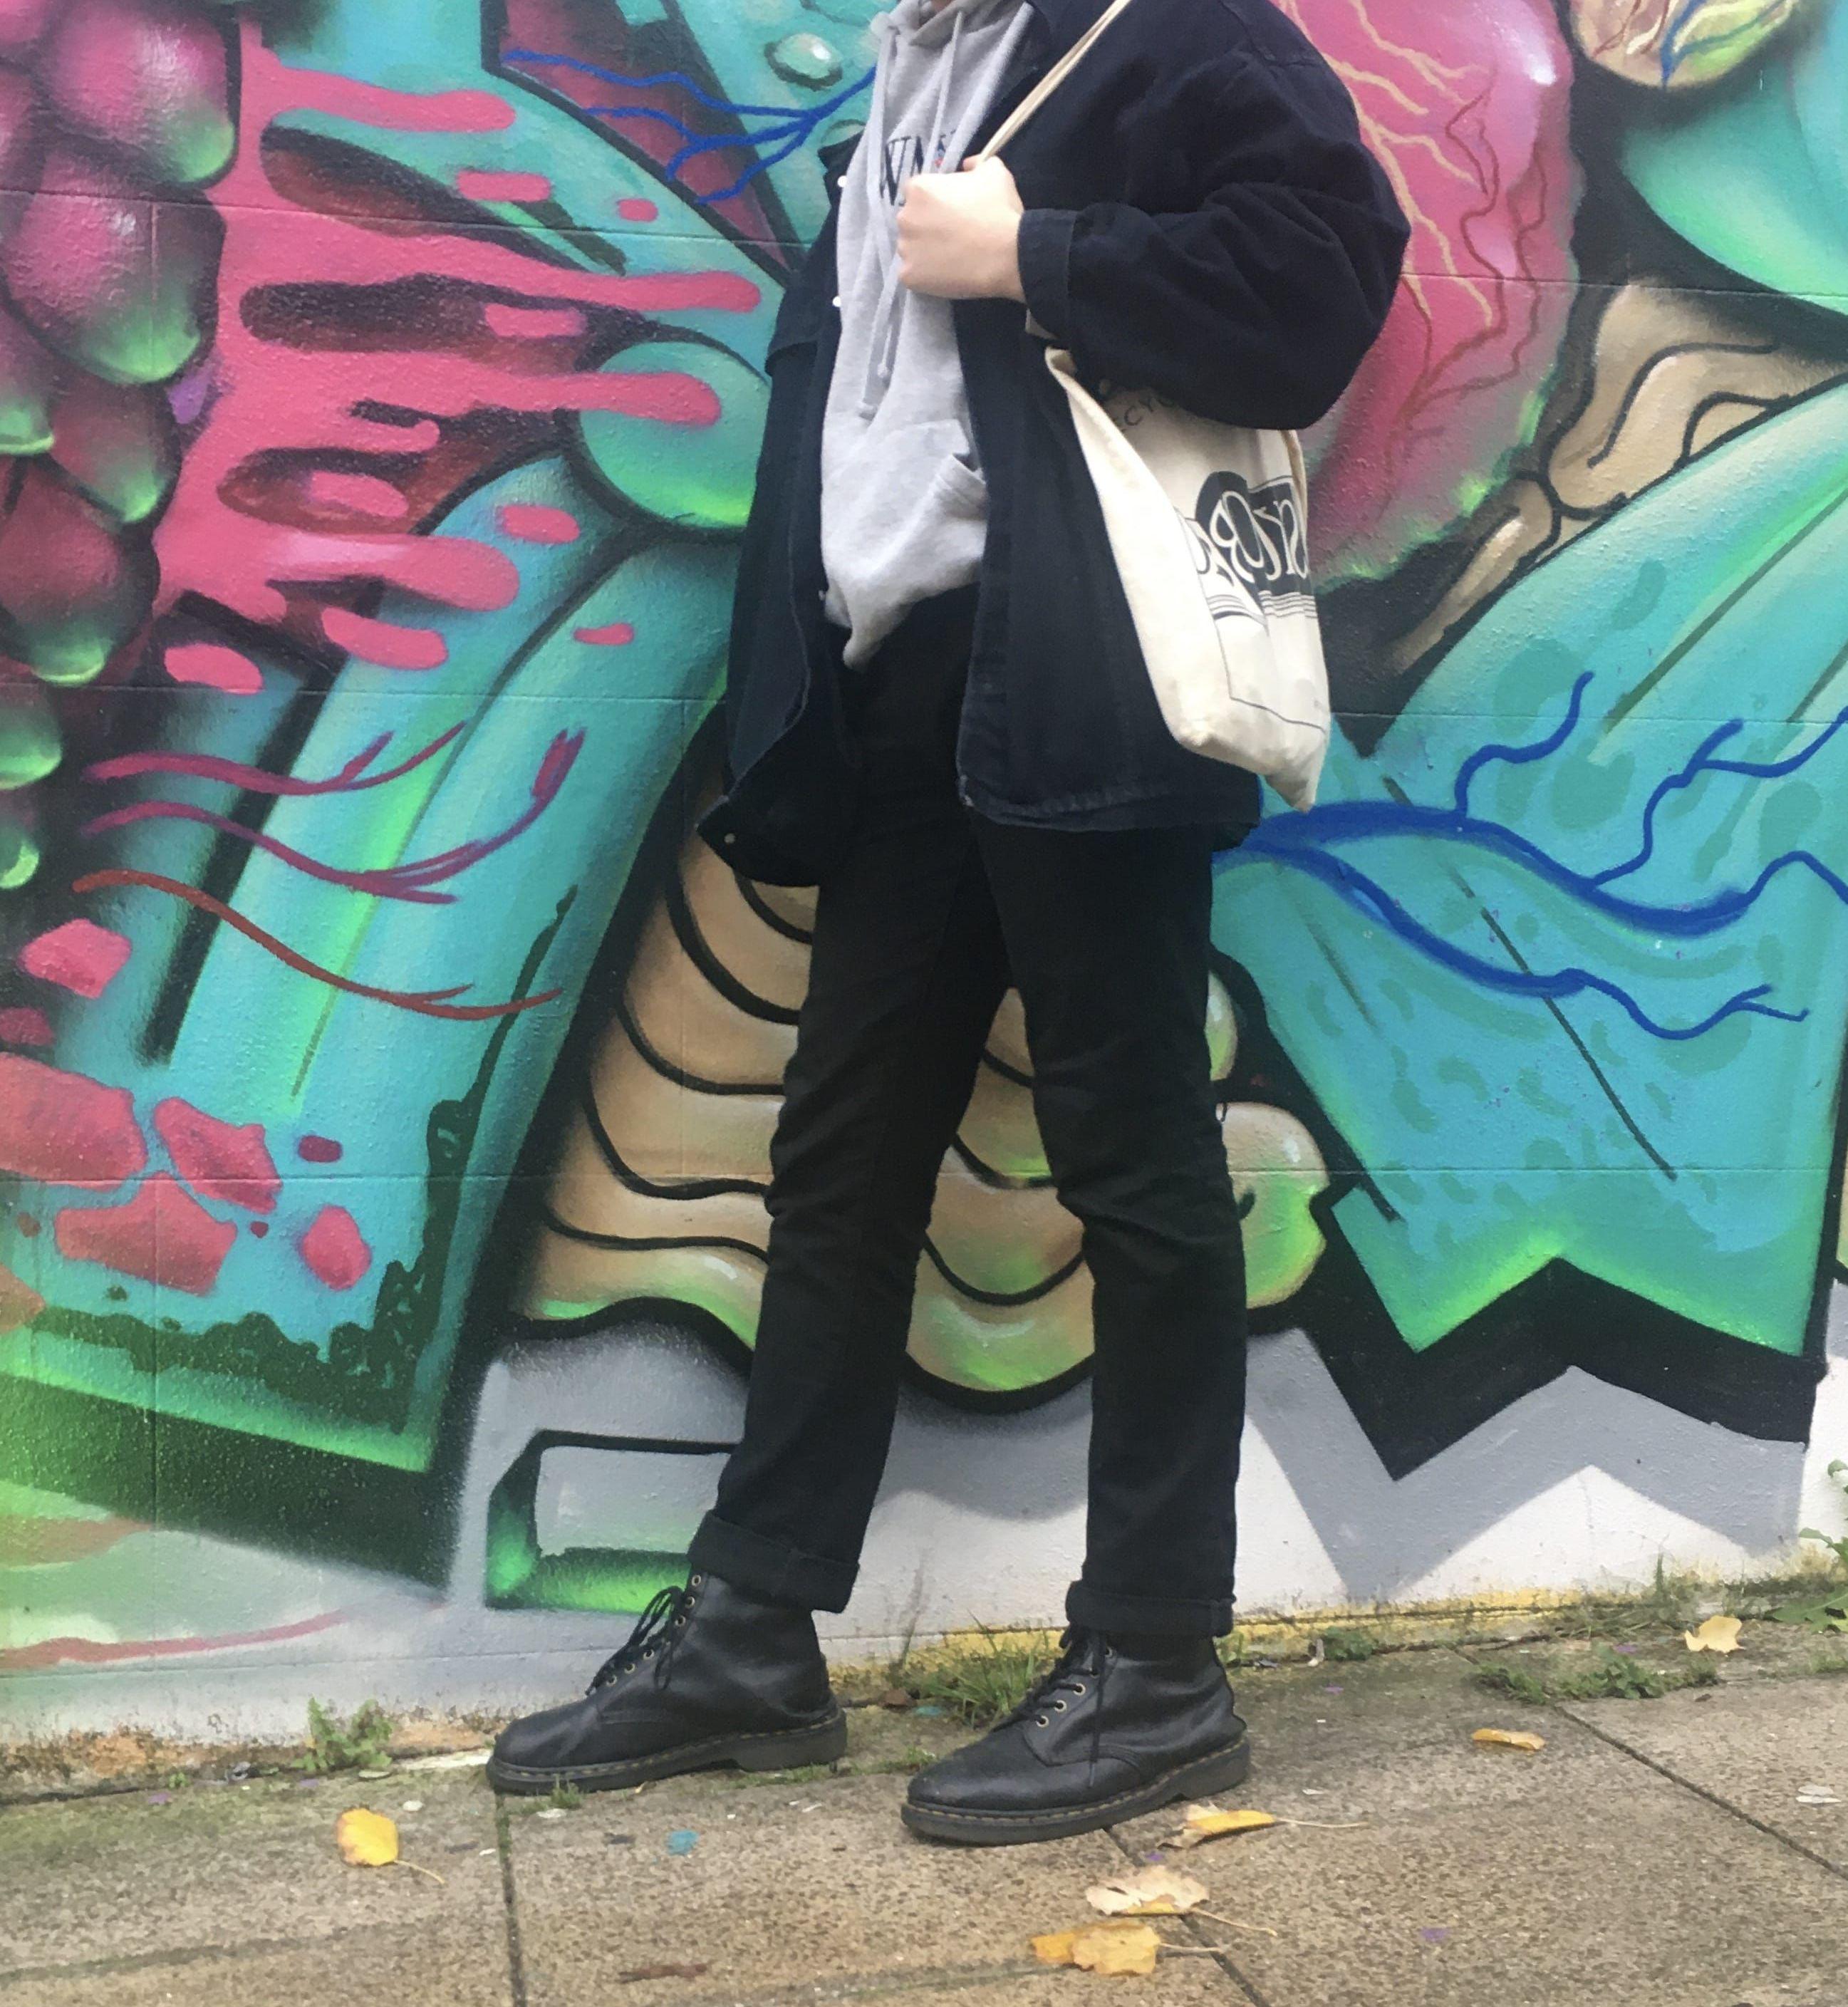 Image may contain: Wall, Painting, Mural, Person, Human, Art, Graffiti, Clothing, Shoe, Apparel, Footwear